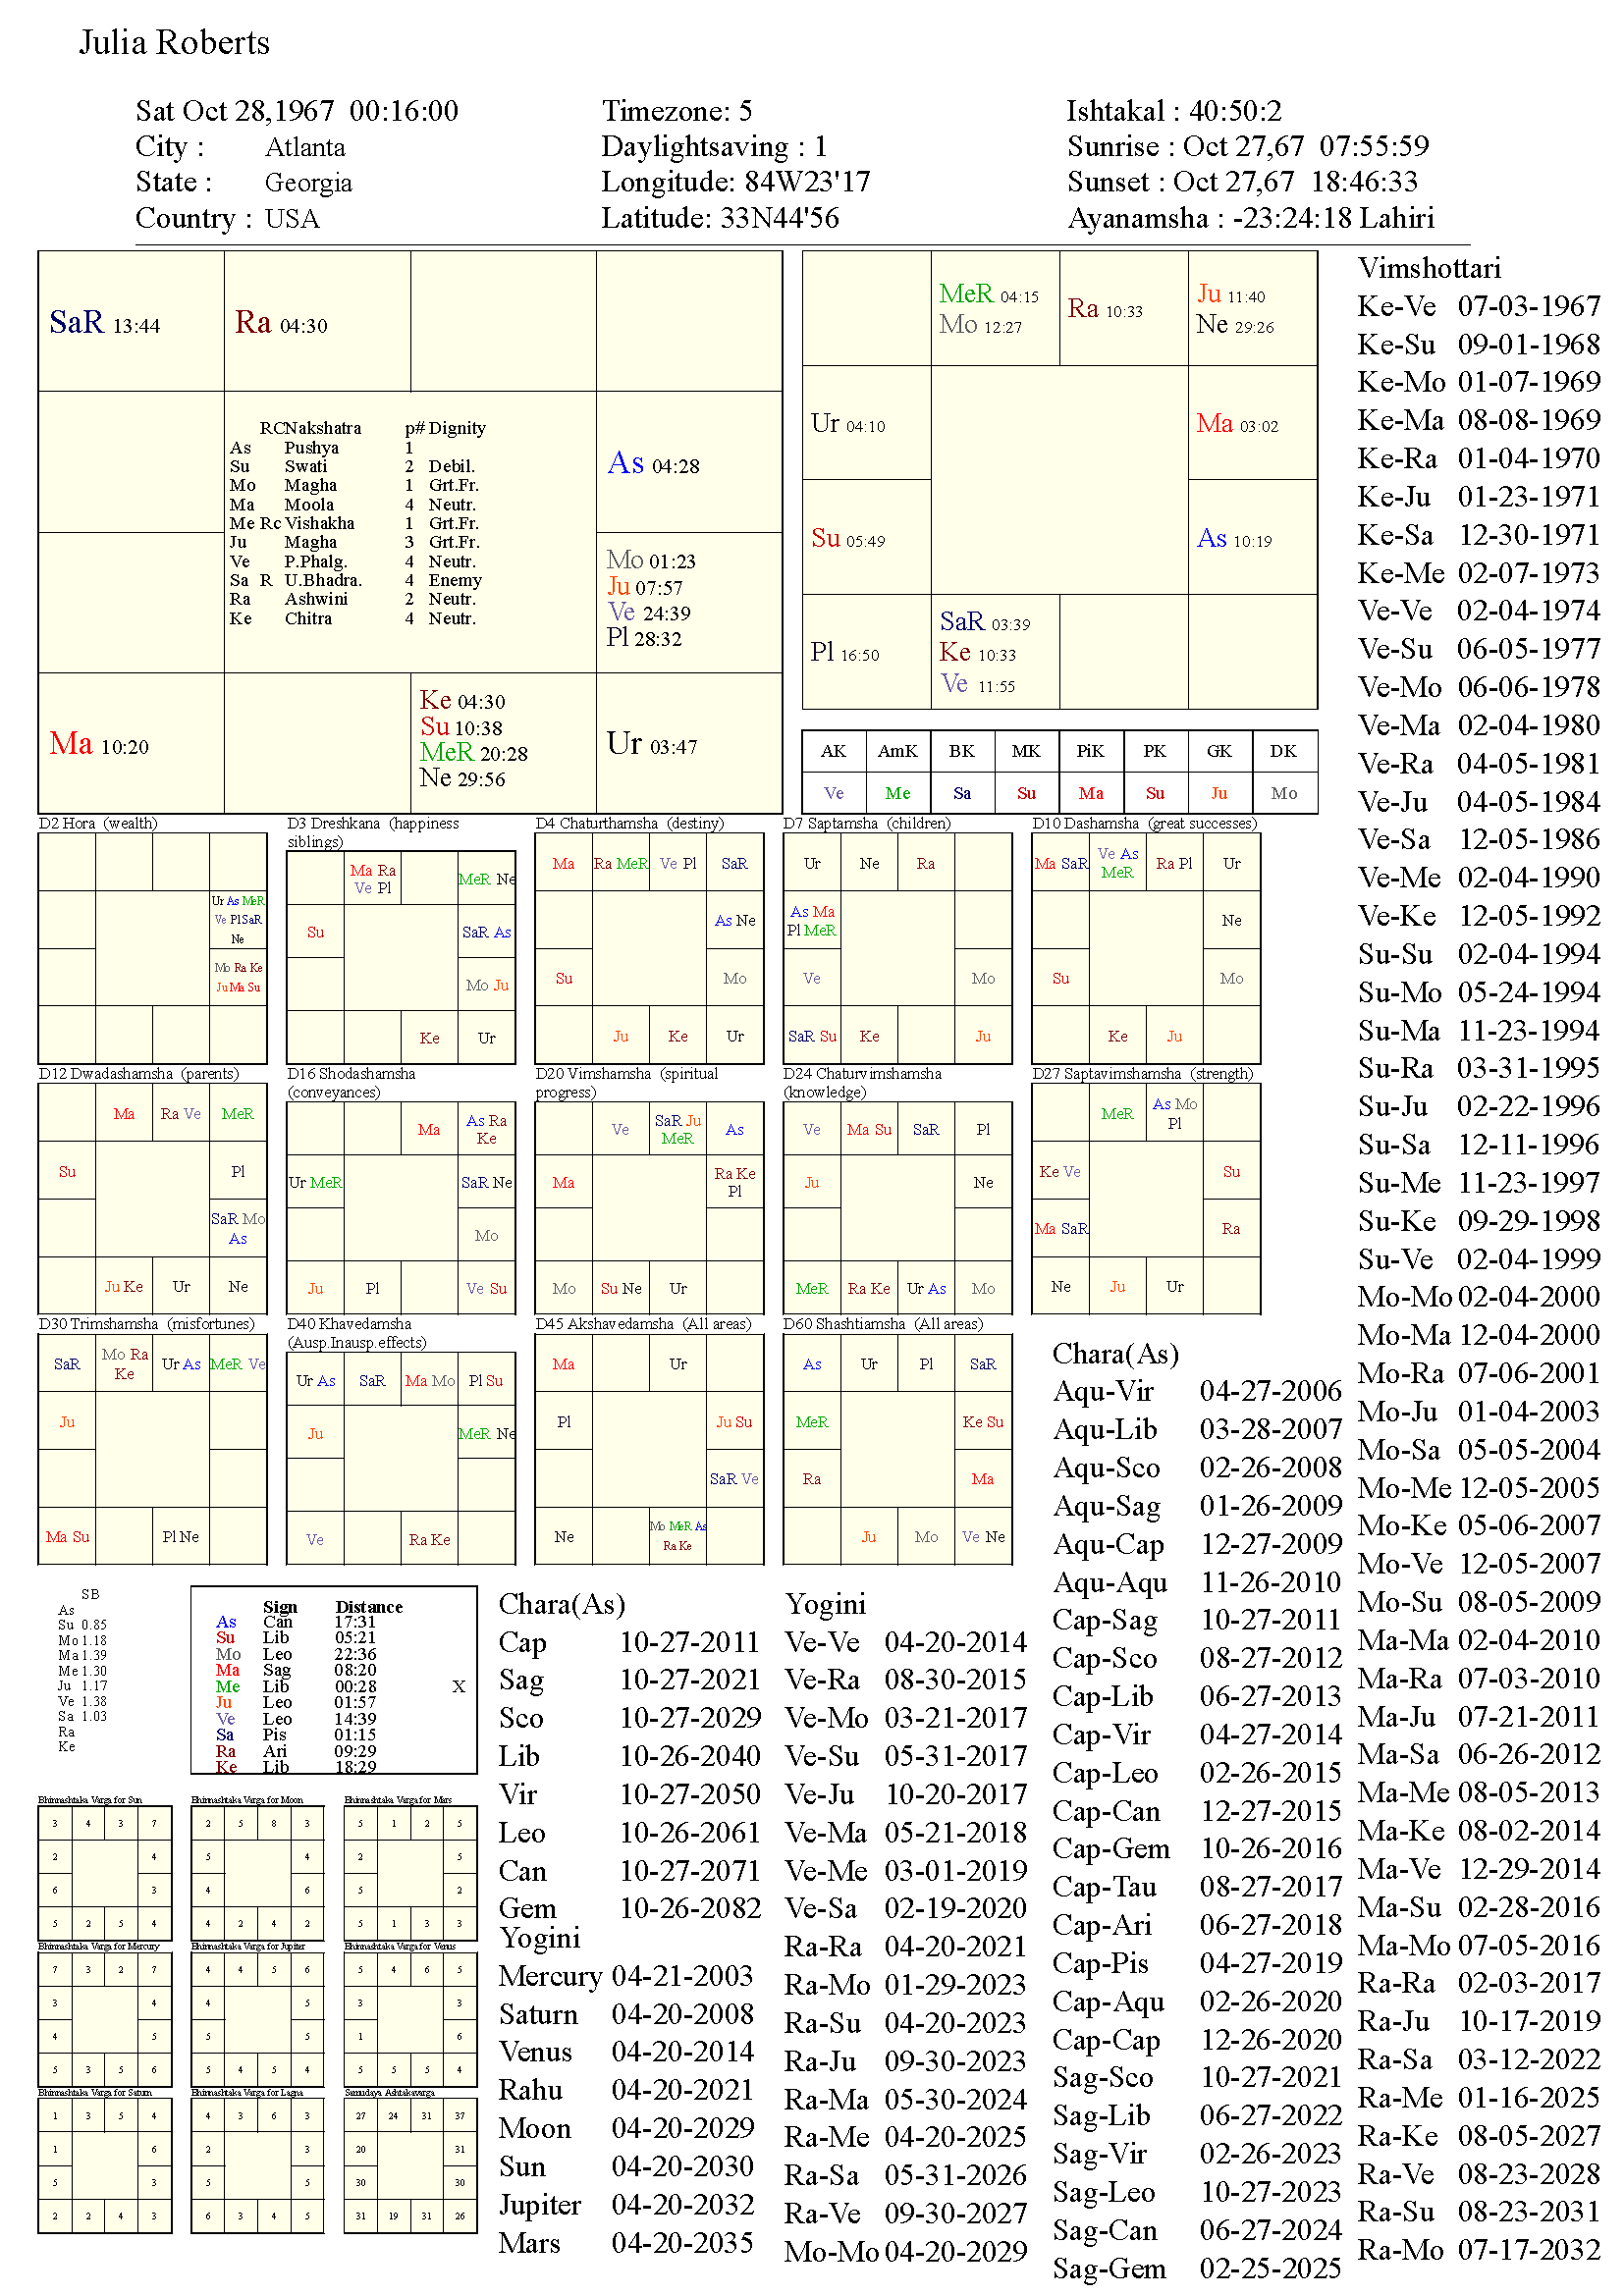 juliaroberts_chart